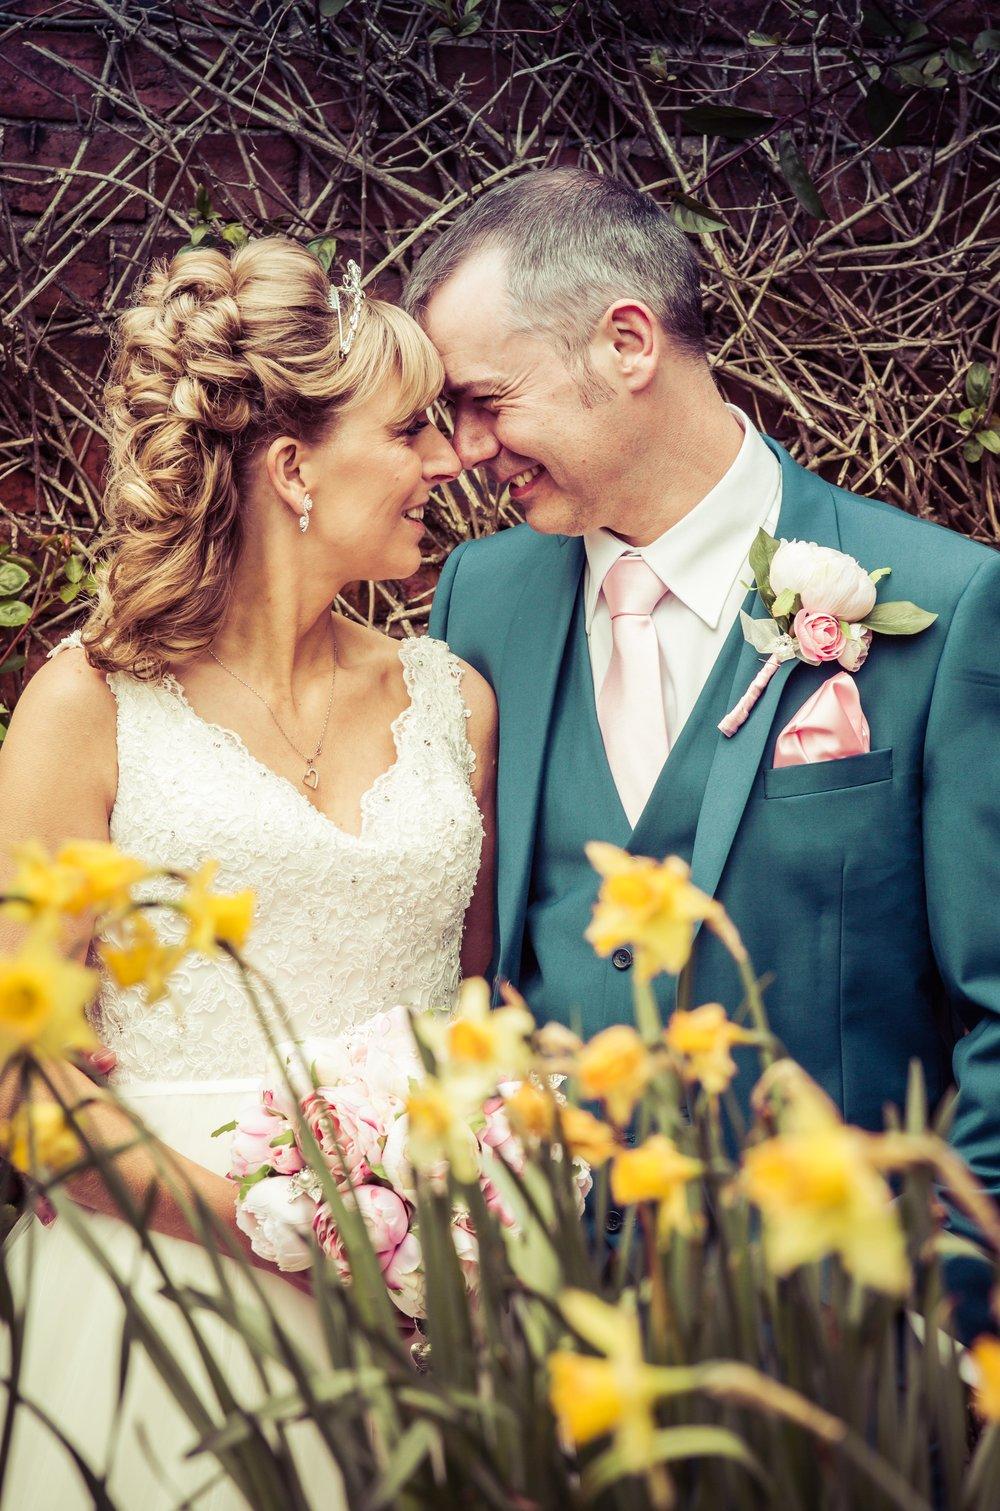 Simon & Michelle's Wedding_Helen Cotton Photography©_25.JPG